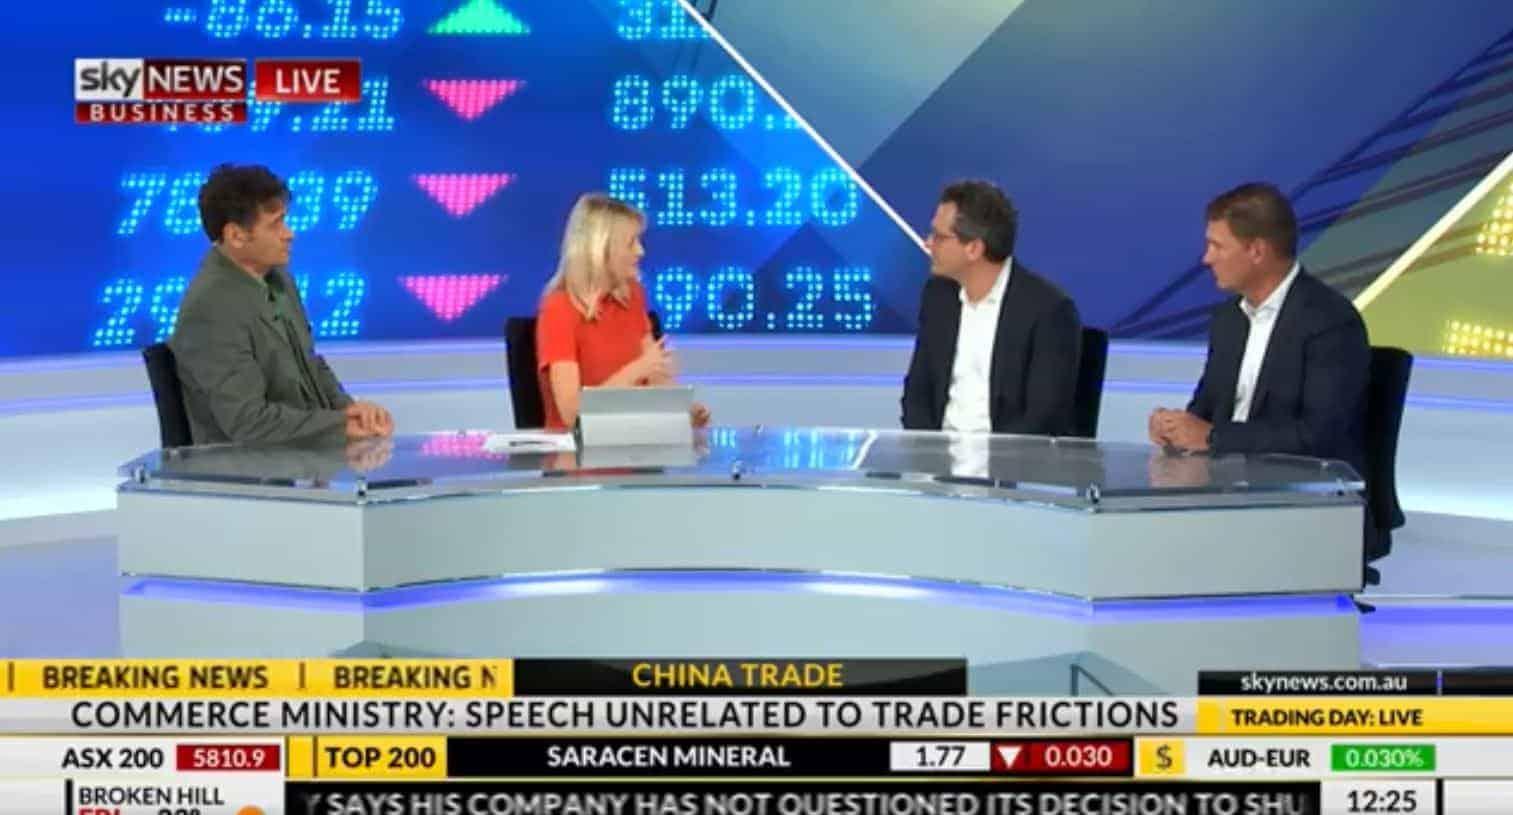 Noah Breslow & Cameron Poolman Interview with Sky News - OnDeck